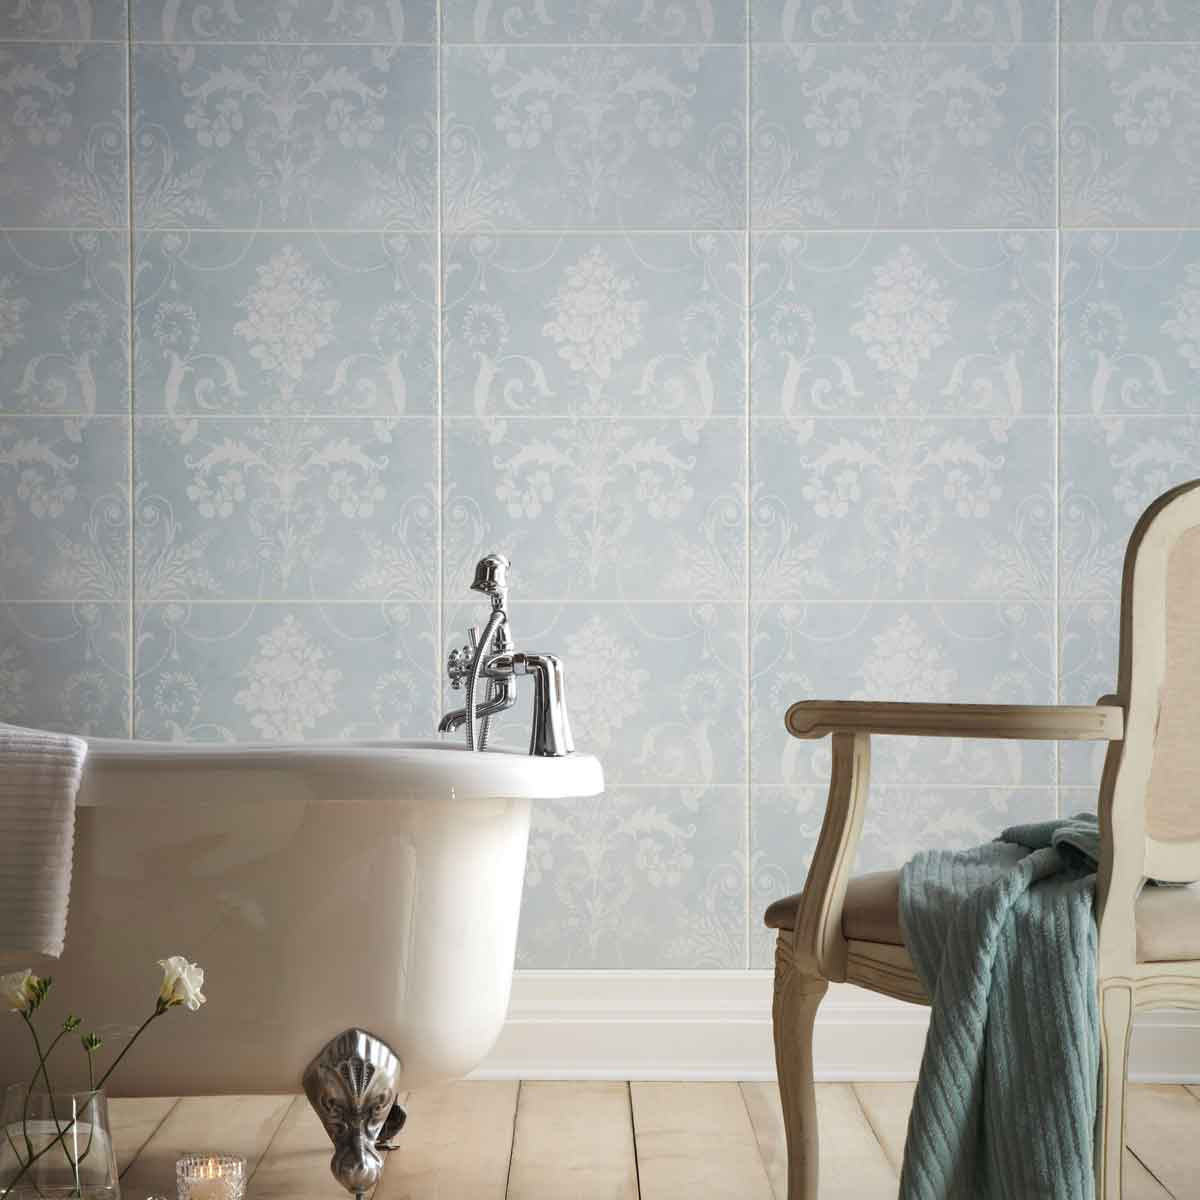 Laura ashley josette duck egg decor wall part a british ceramic tile dailygadgetfo Gallery